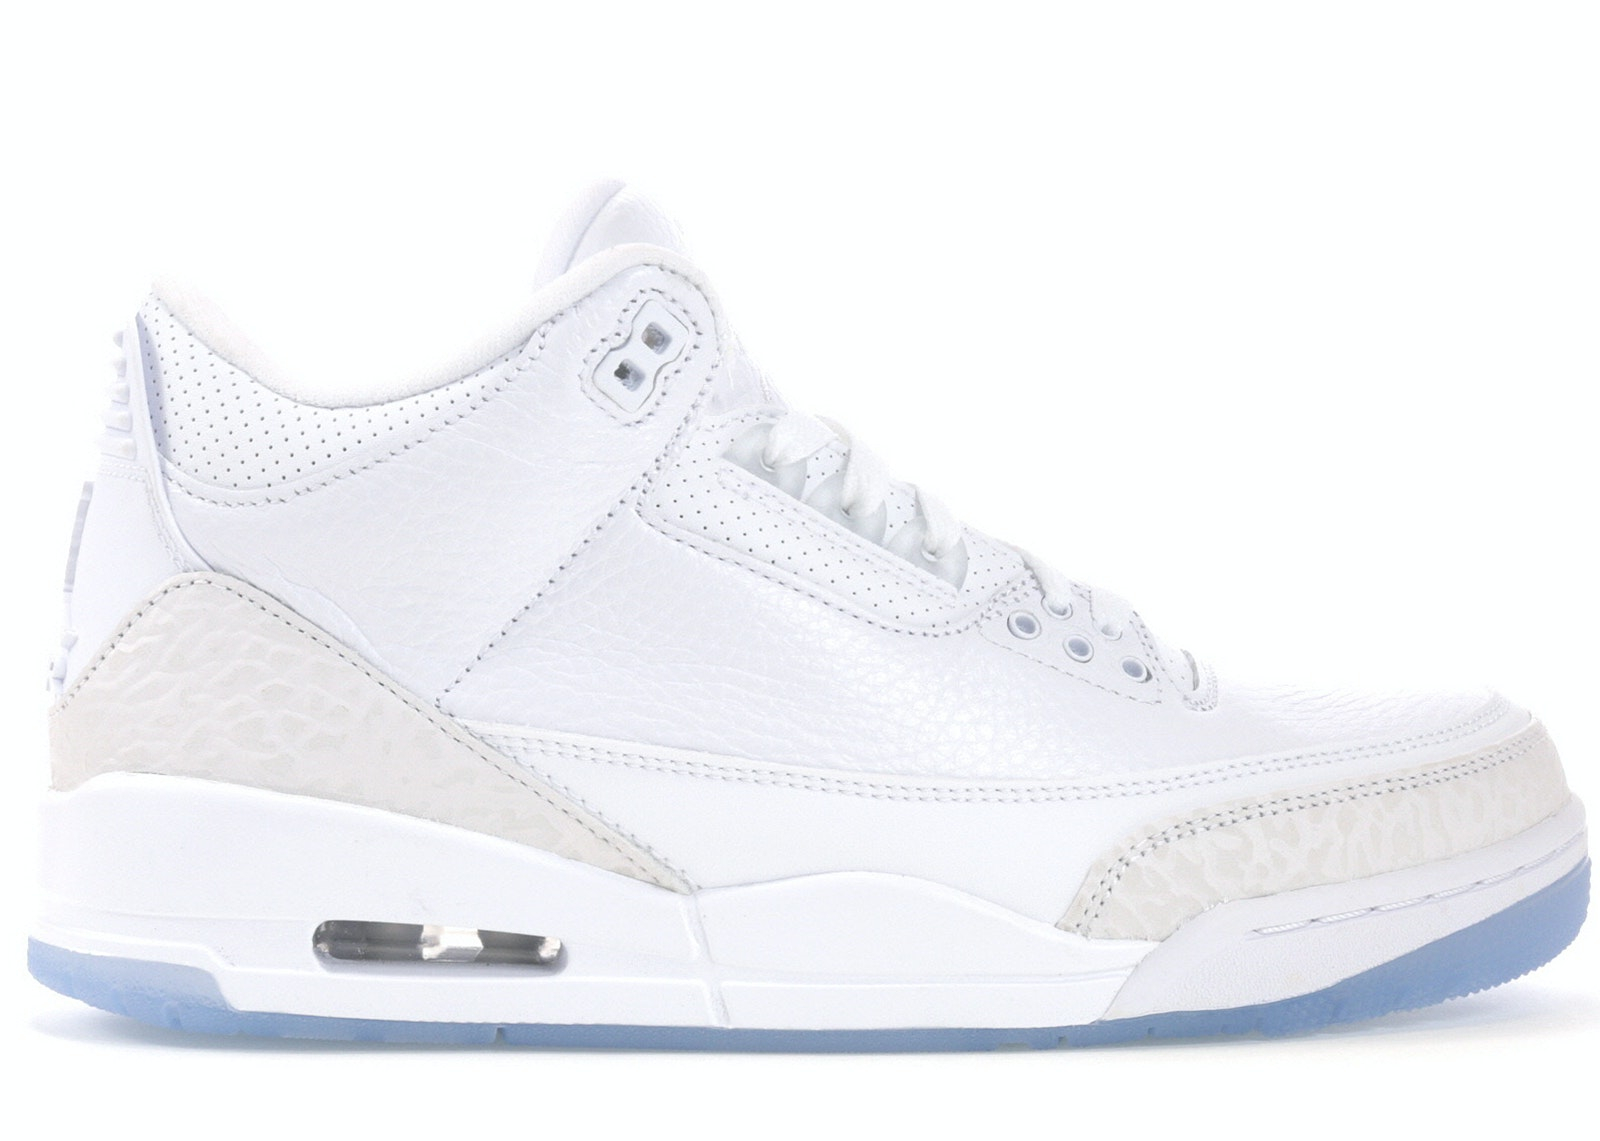 Jordan 3 Retro Pure White (2018)